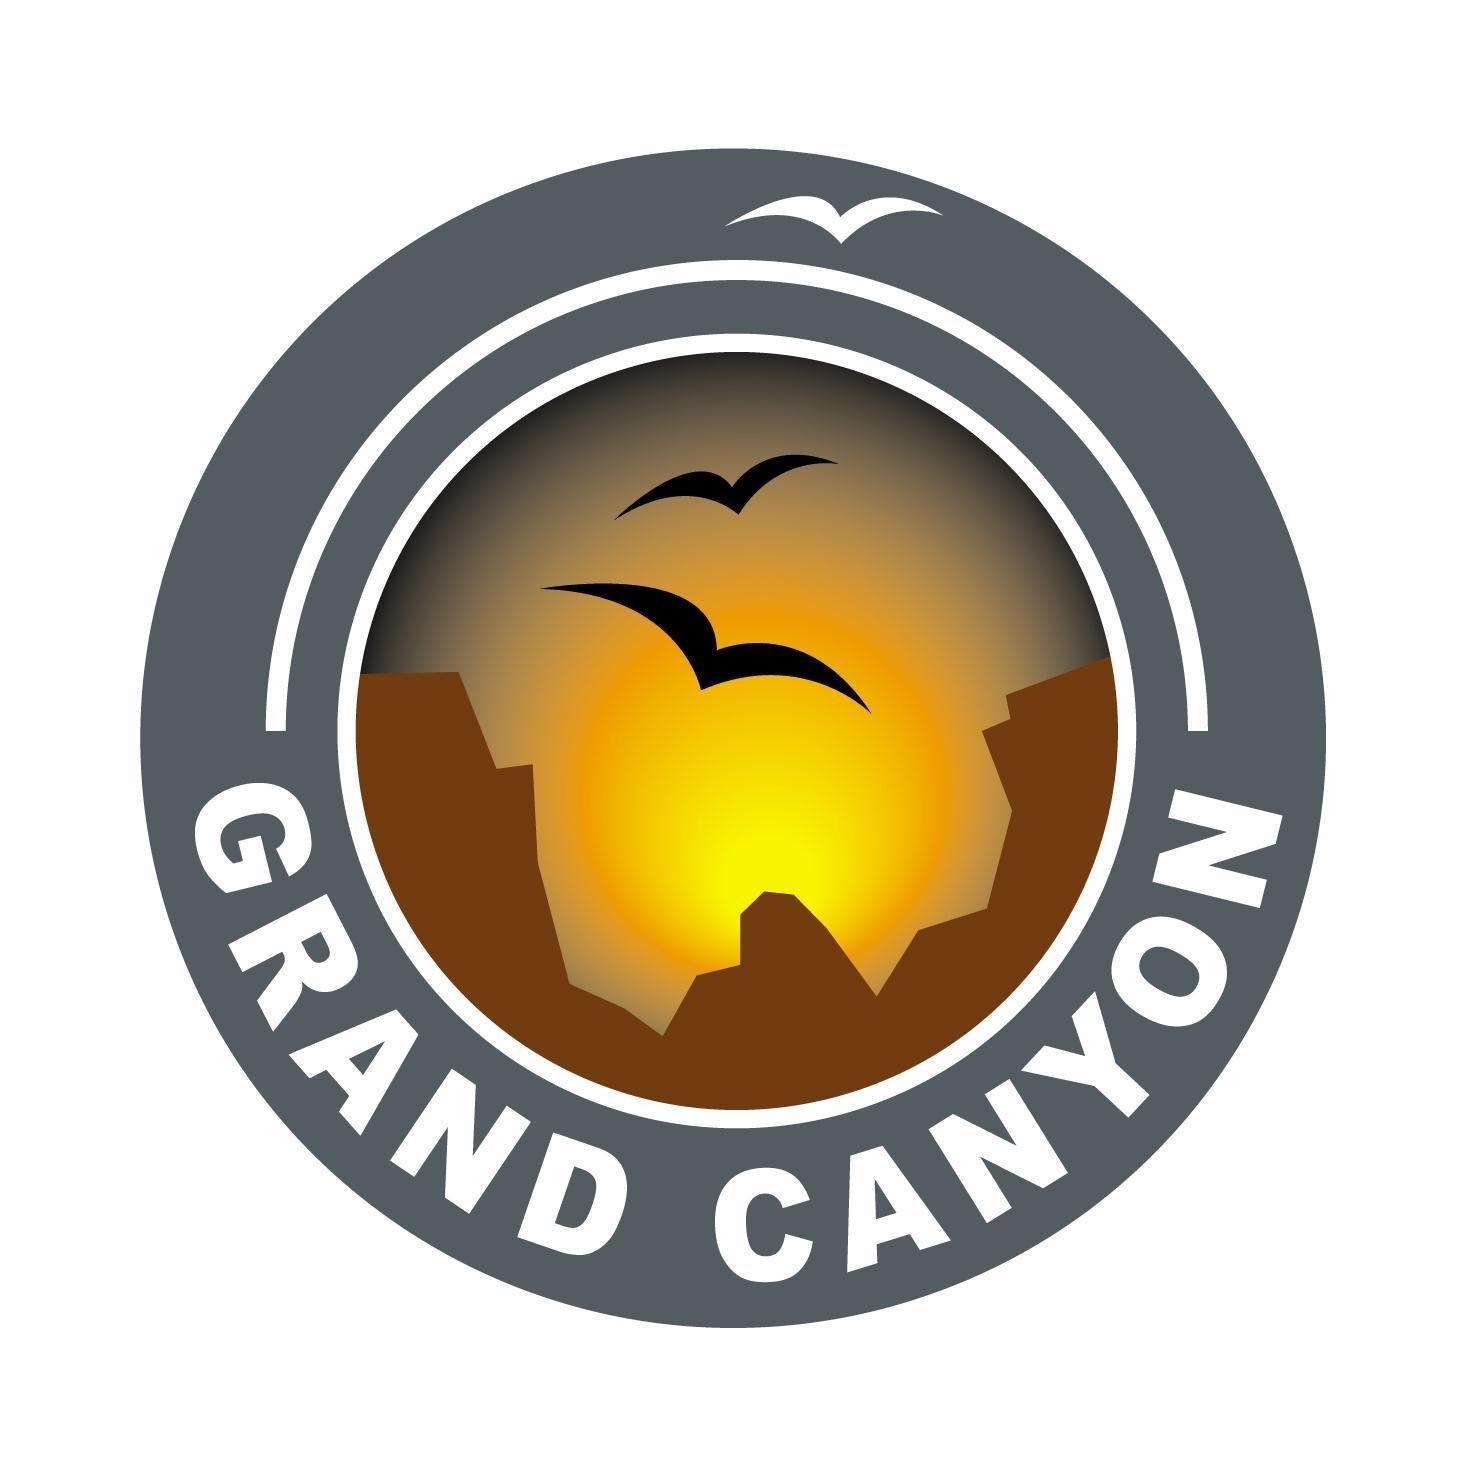 grand canyon cardova 1 trekkingzelt 1 2 personen zelt. Black Bedroom Furniture Sets. Home Design Ideas